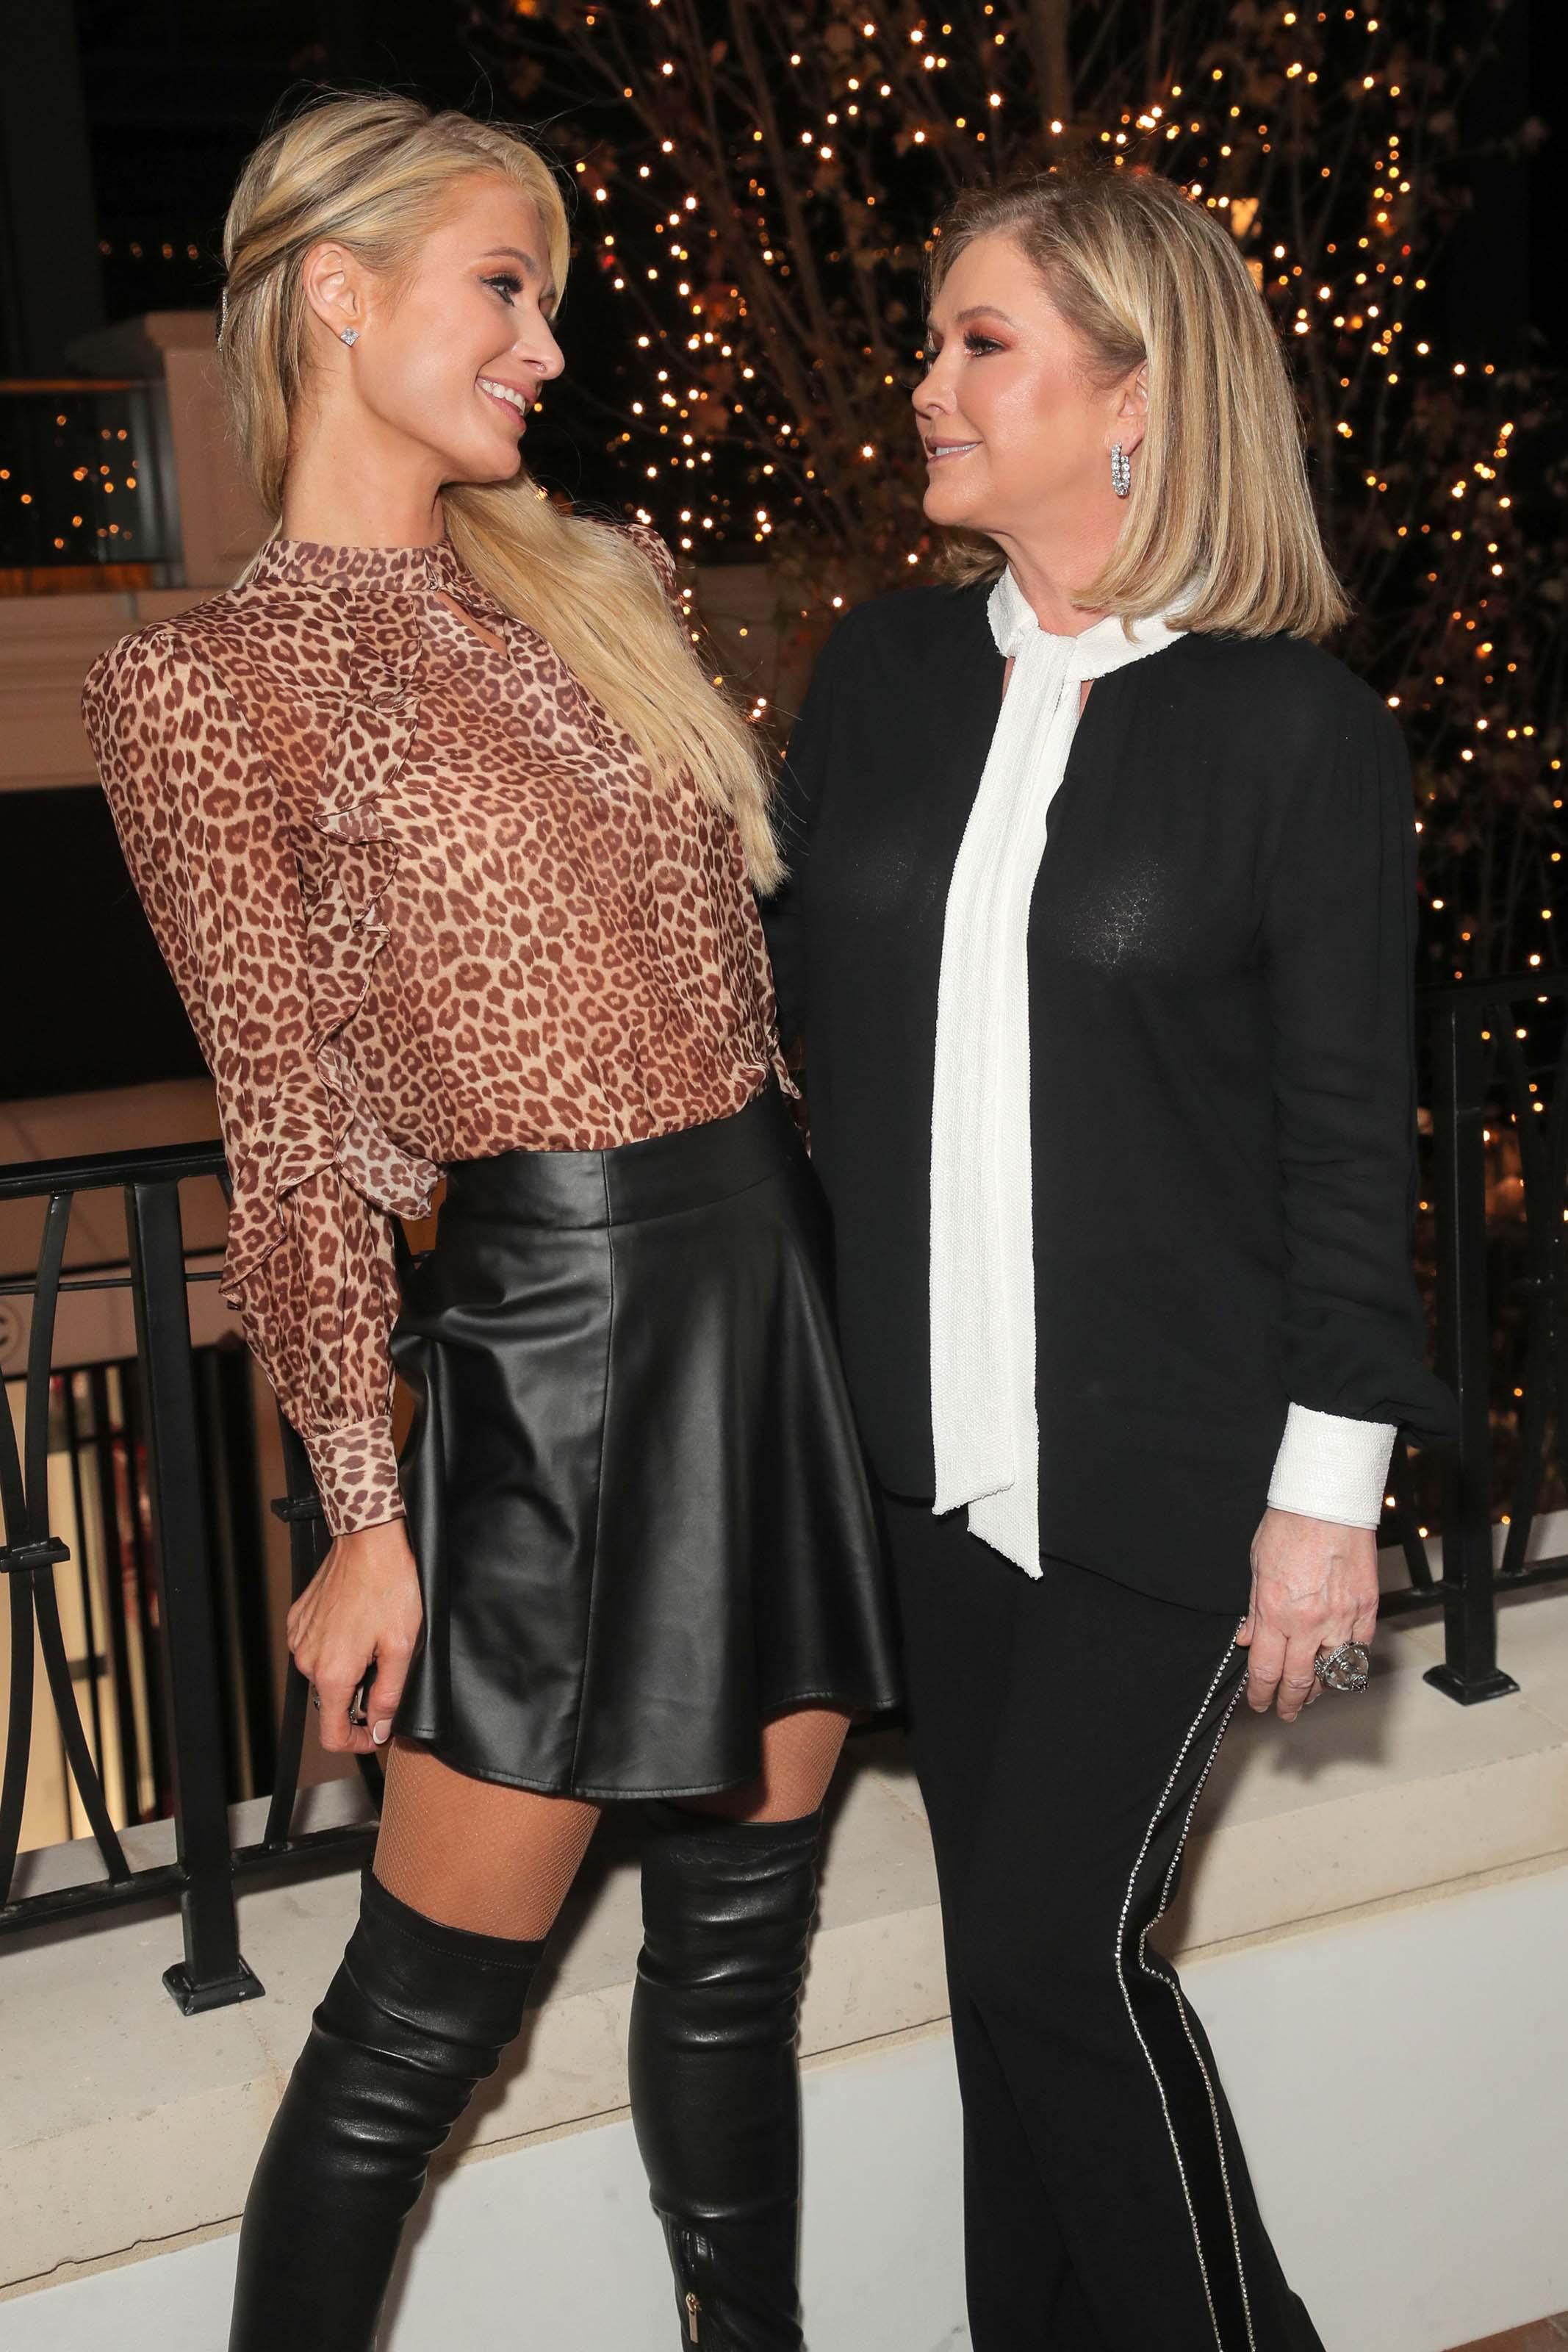 Paris Hilton attends Rachel Zoe Palisades Village Holiday Celebration